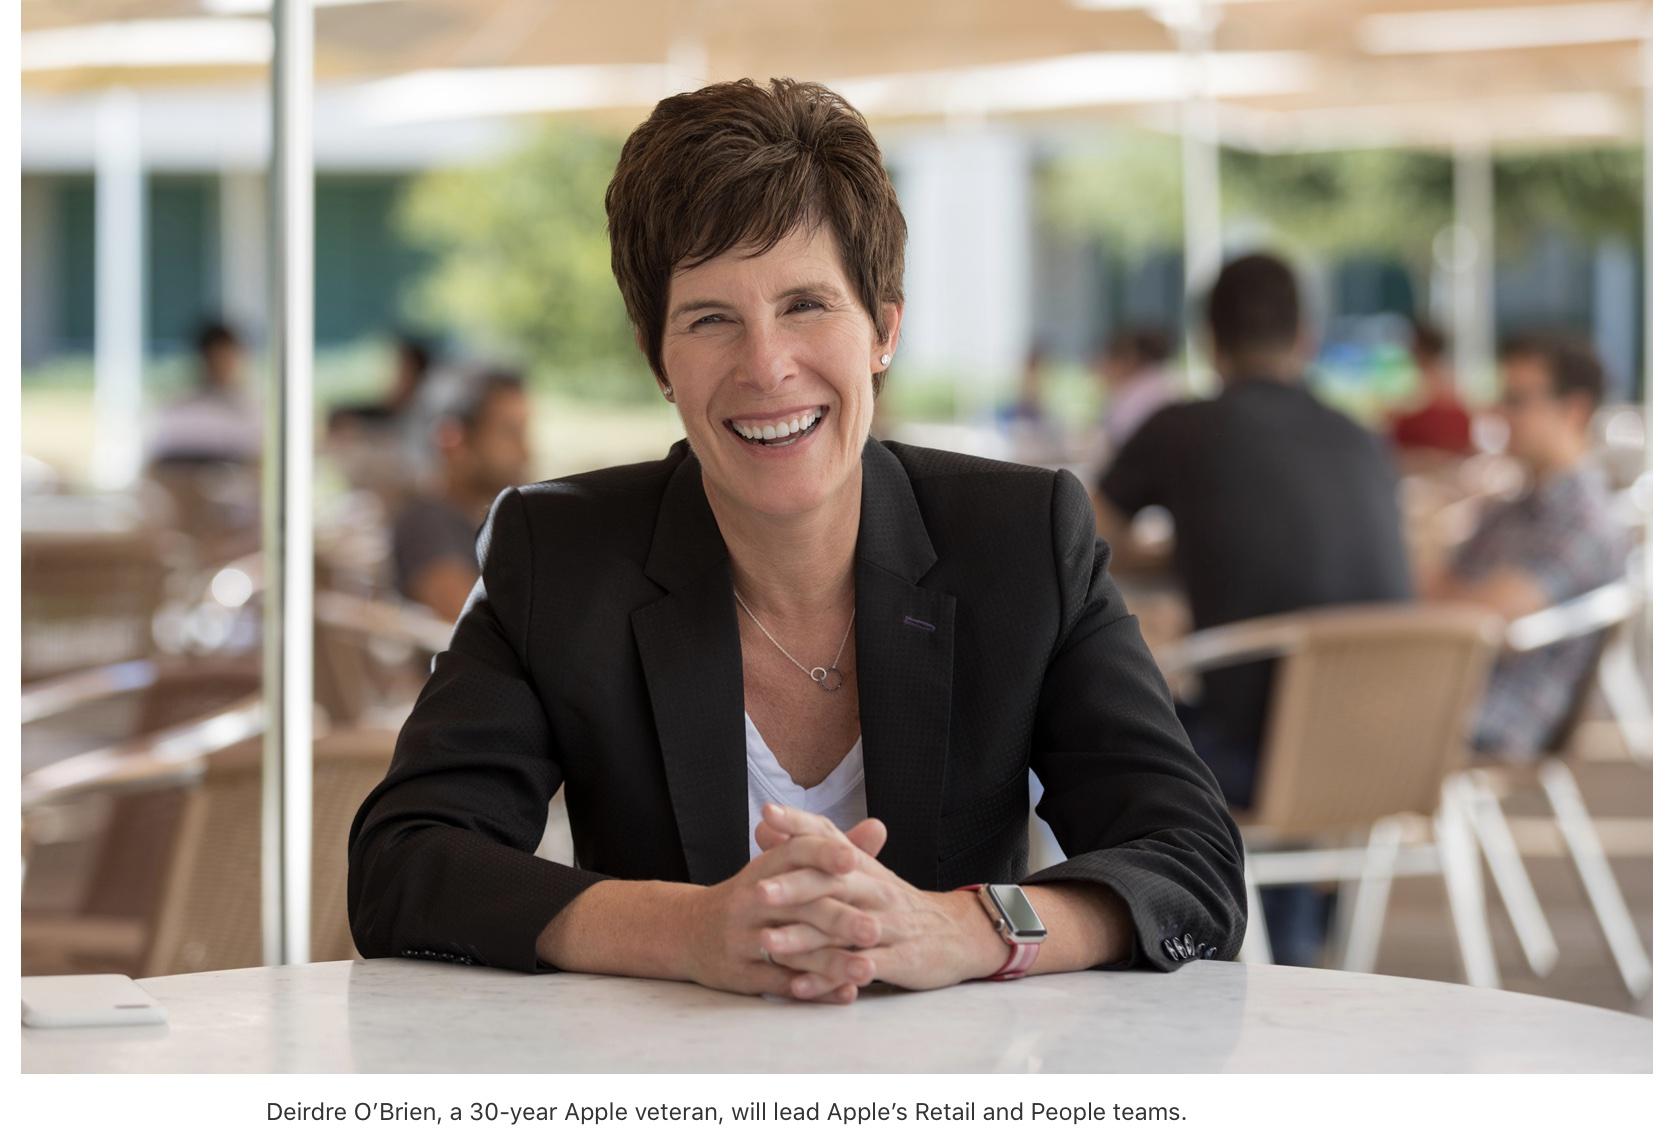 Apple names Deirdre O'Brien senior VP of Retail + People